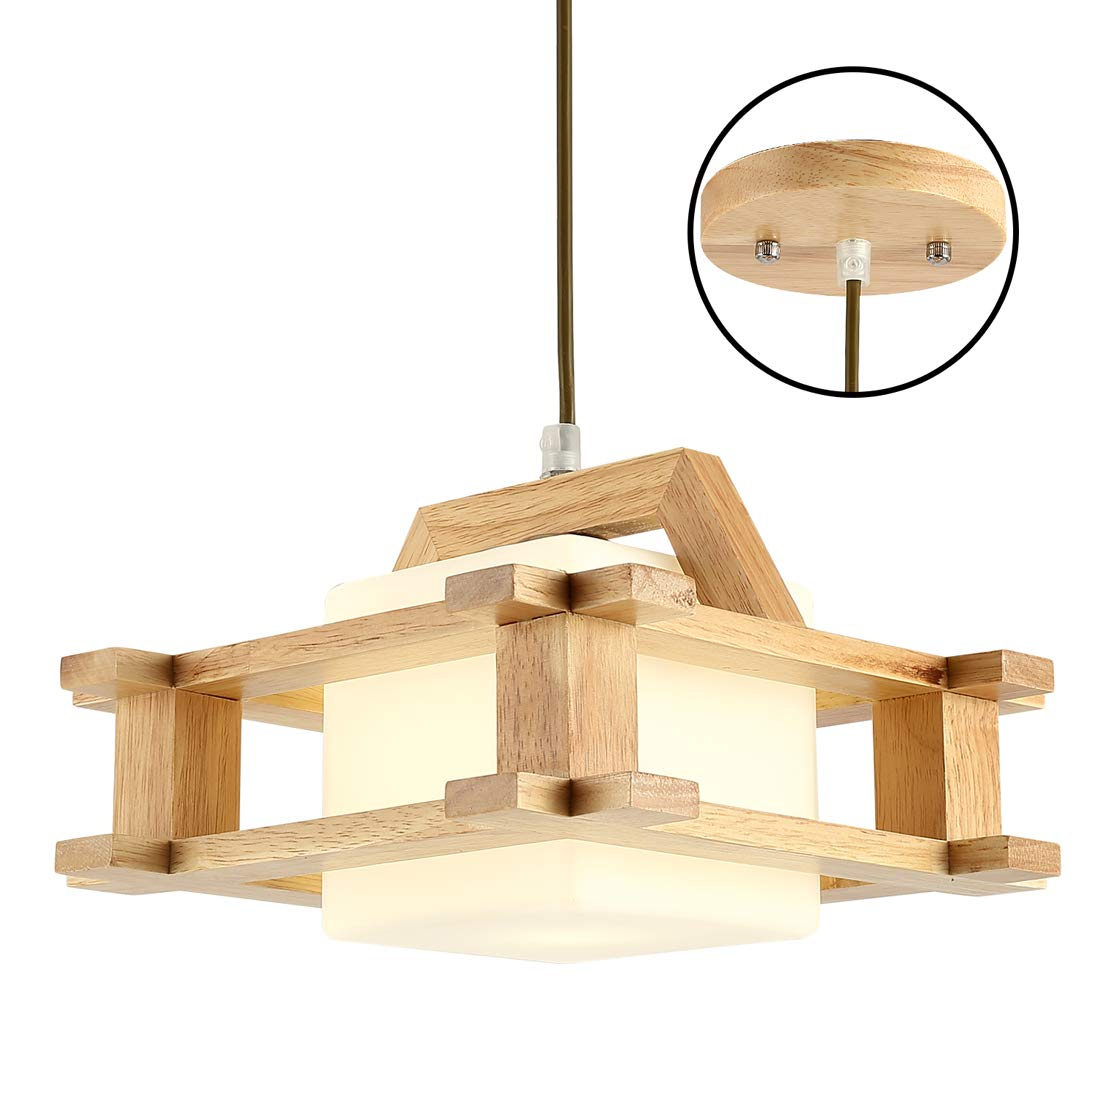 Wood Pendant Lamp Nordic Retro 1 Light Wood Pendant Lamp for Restaurant Bar Ceiling Light Fixture